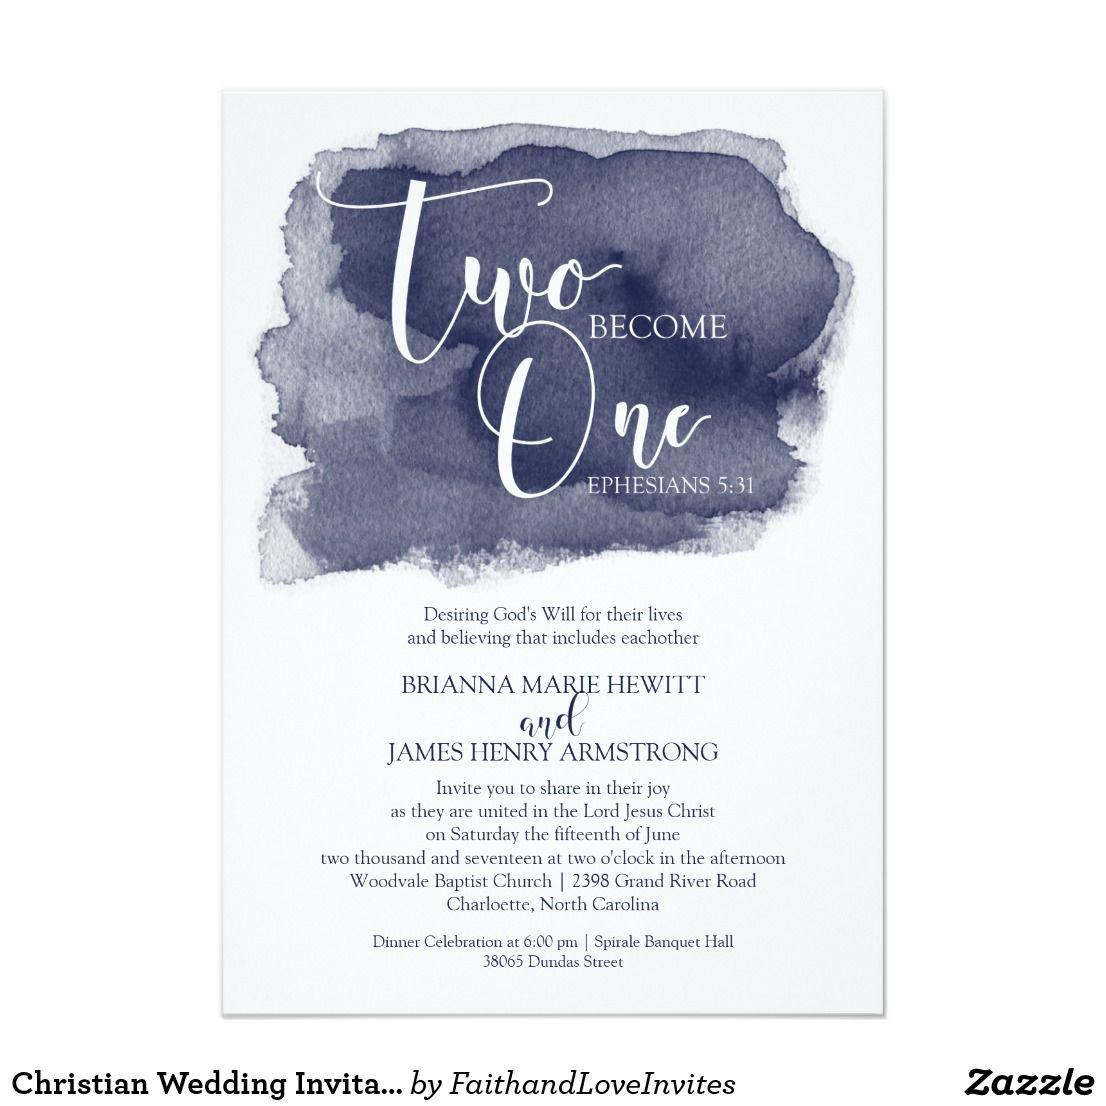 Christian Wedding Reception Ideas: Christian Wedding Invitation - Watercolor Navy